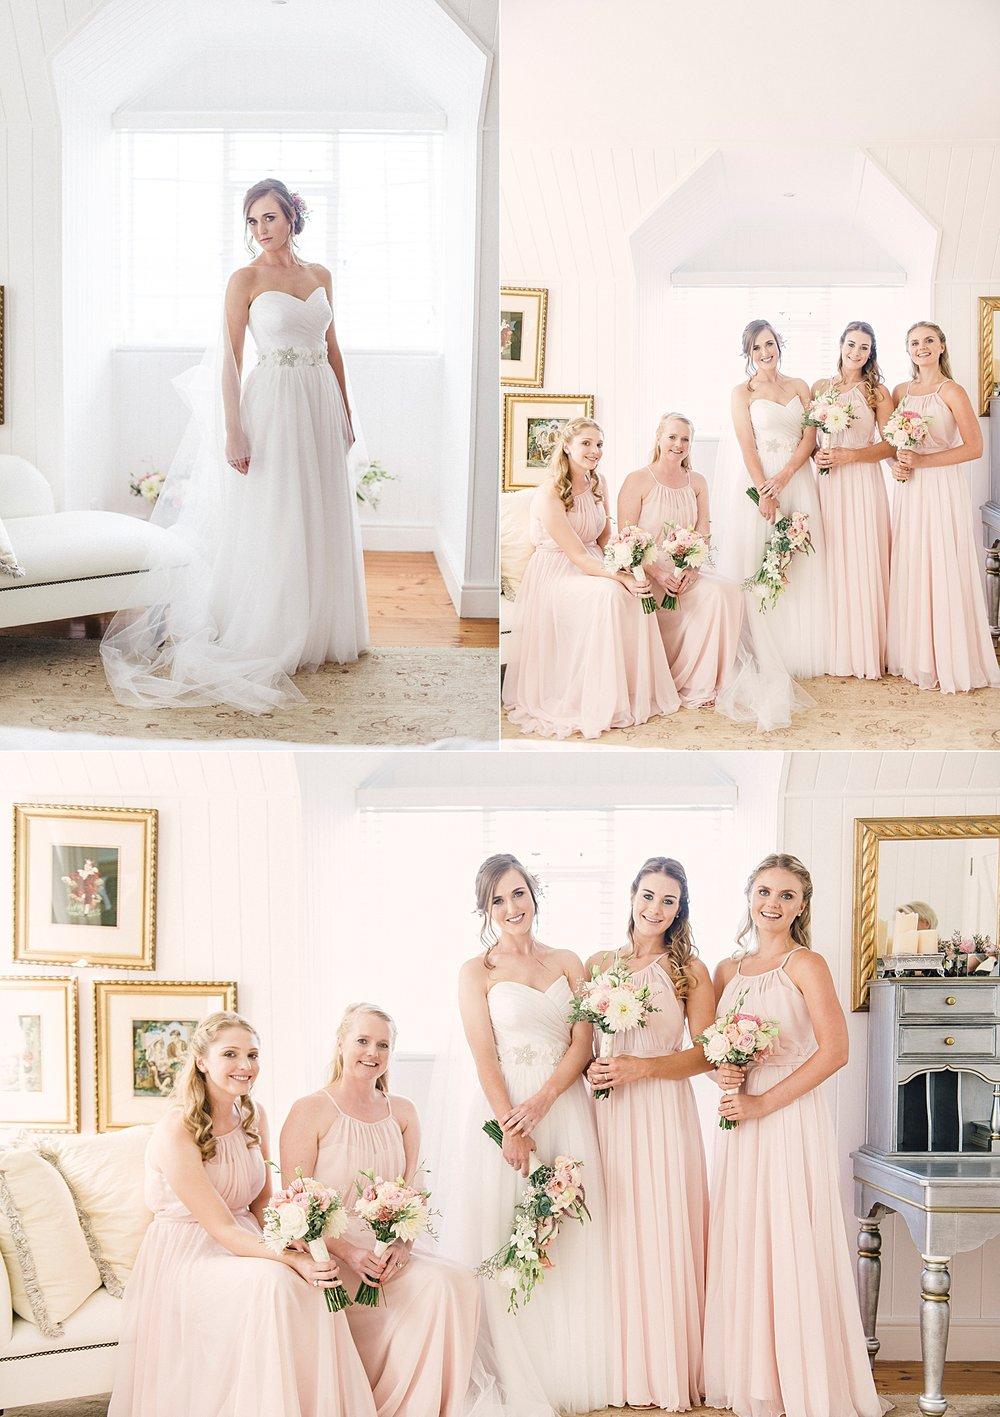 RyanParker_WeddingPhotographer_CapeTown_BonaDea_Hermanus_S&A_DSC_1484.jpg